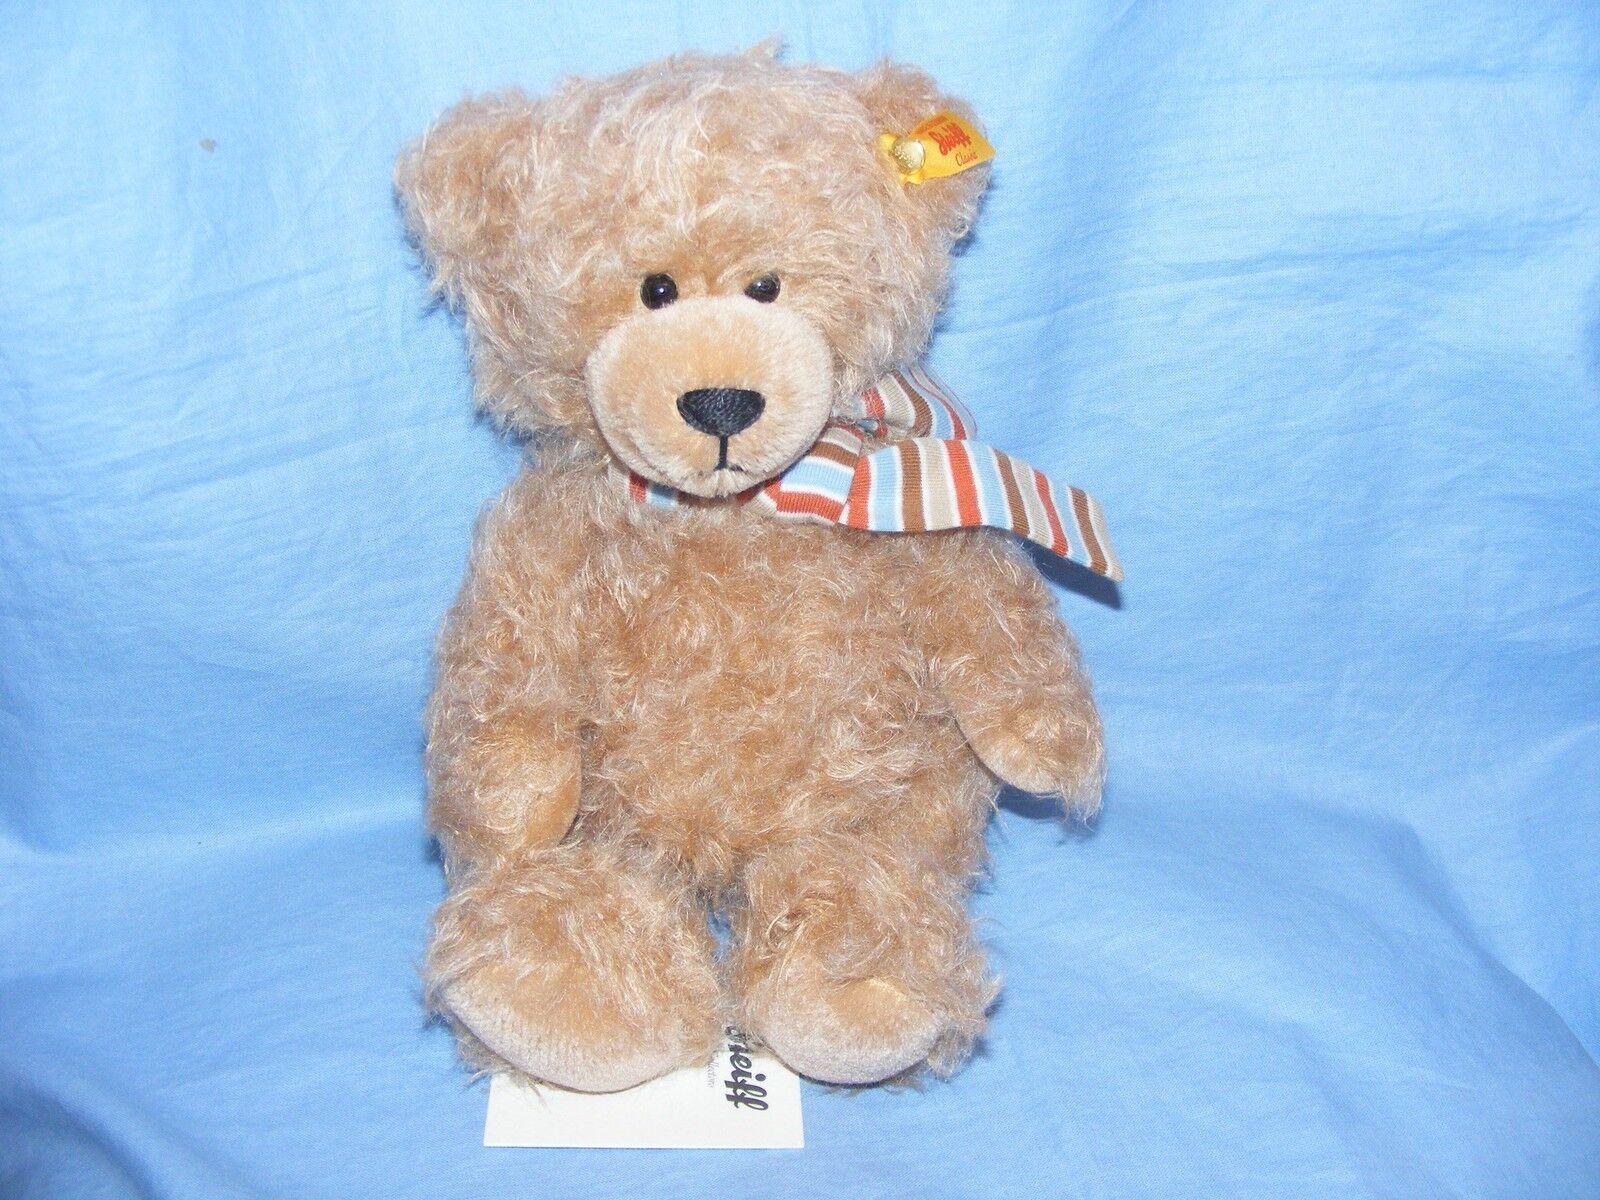 Steiff Klassisches Teddybär Nils Bär Keilzinkenanlage Hellbraun 26cm 026829